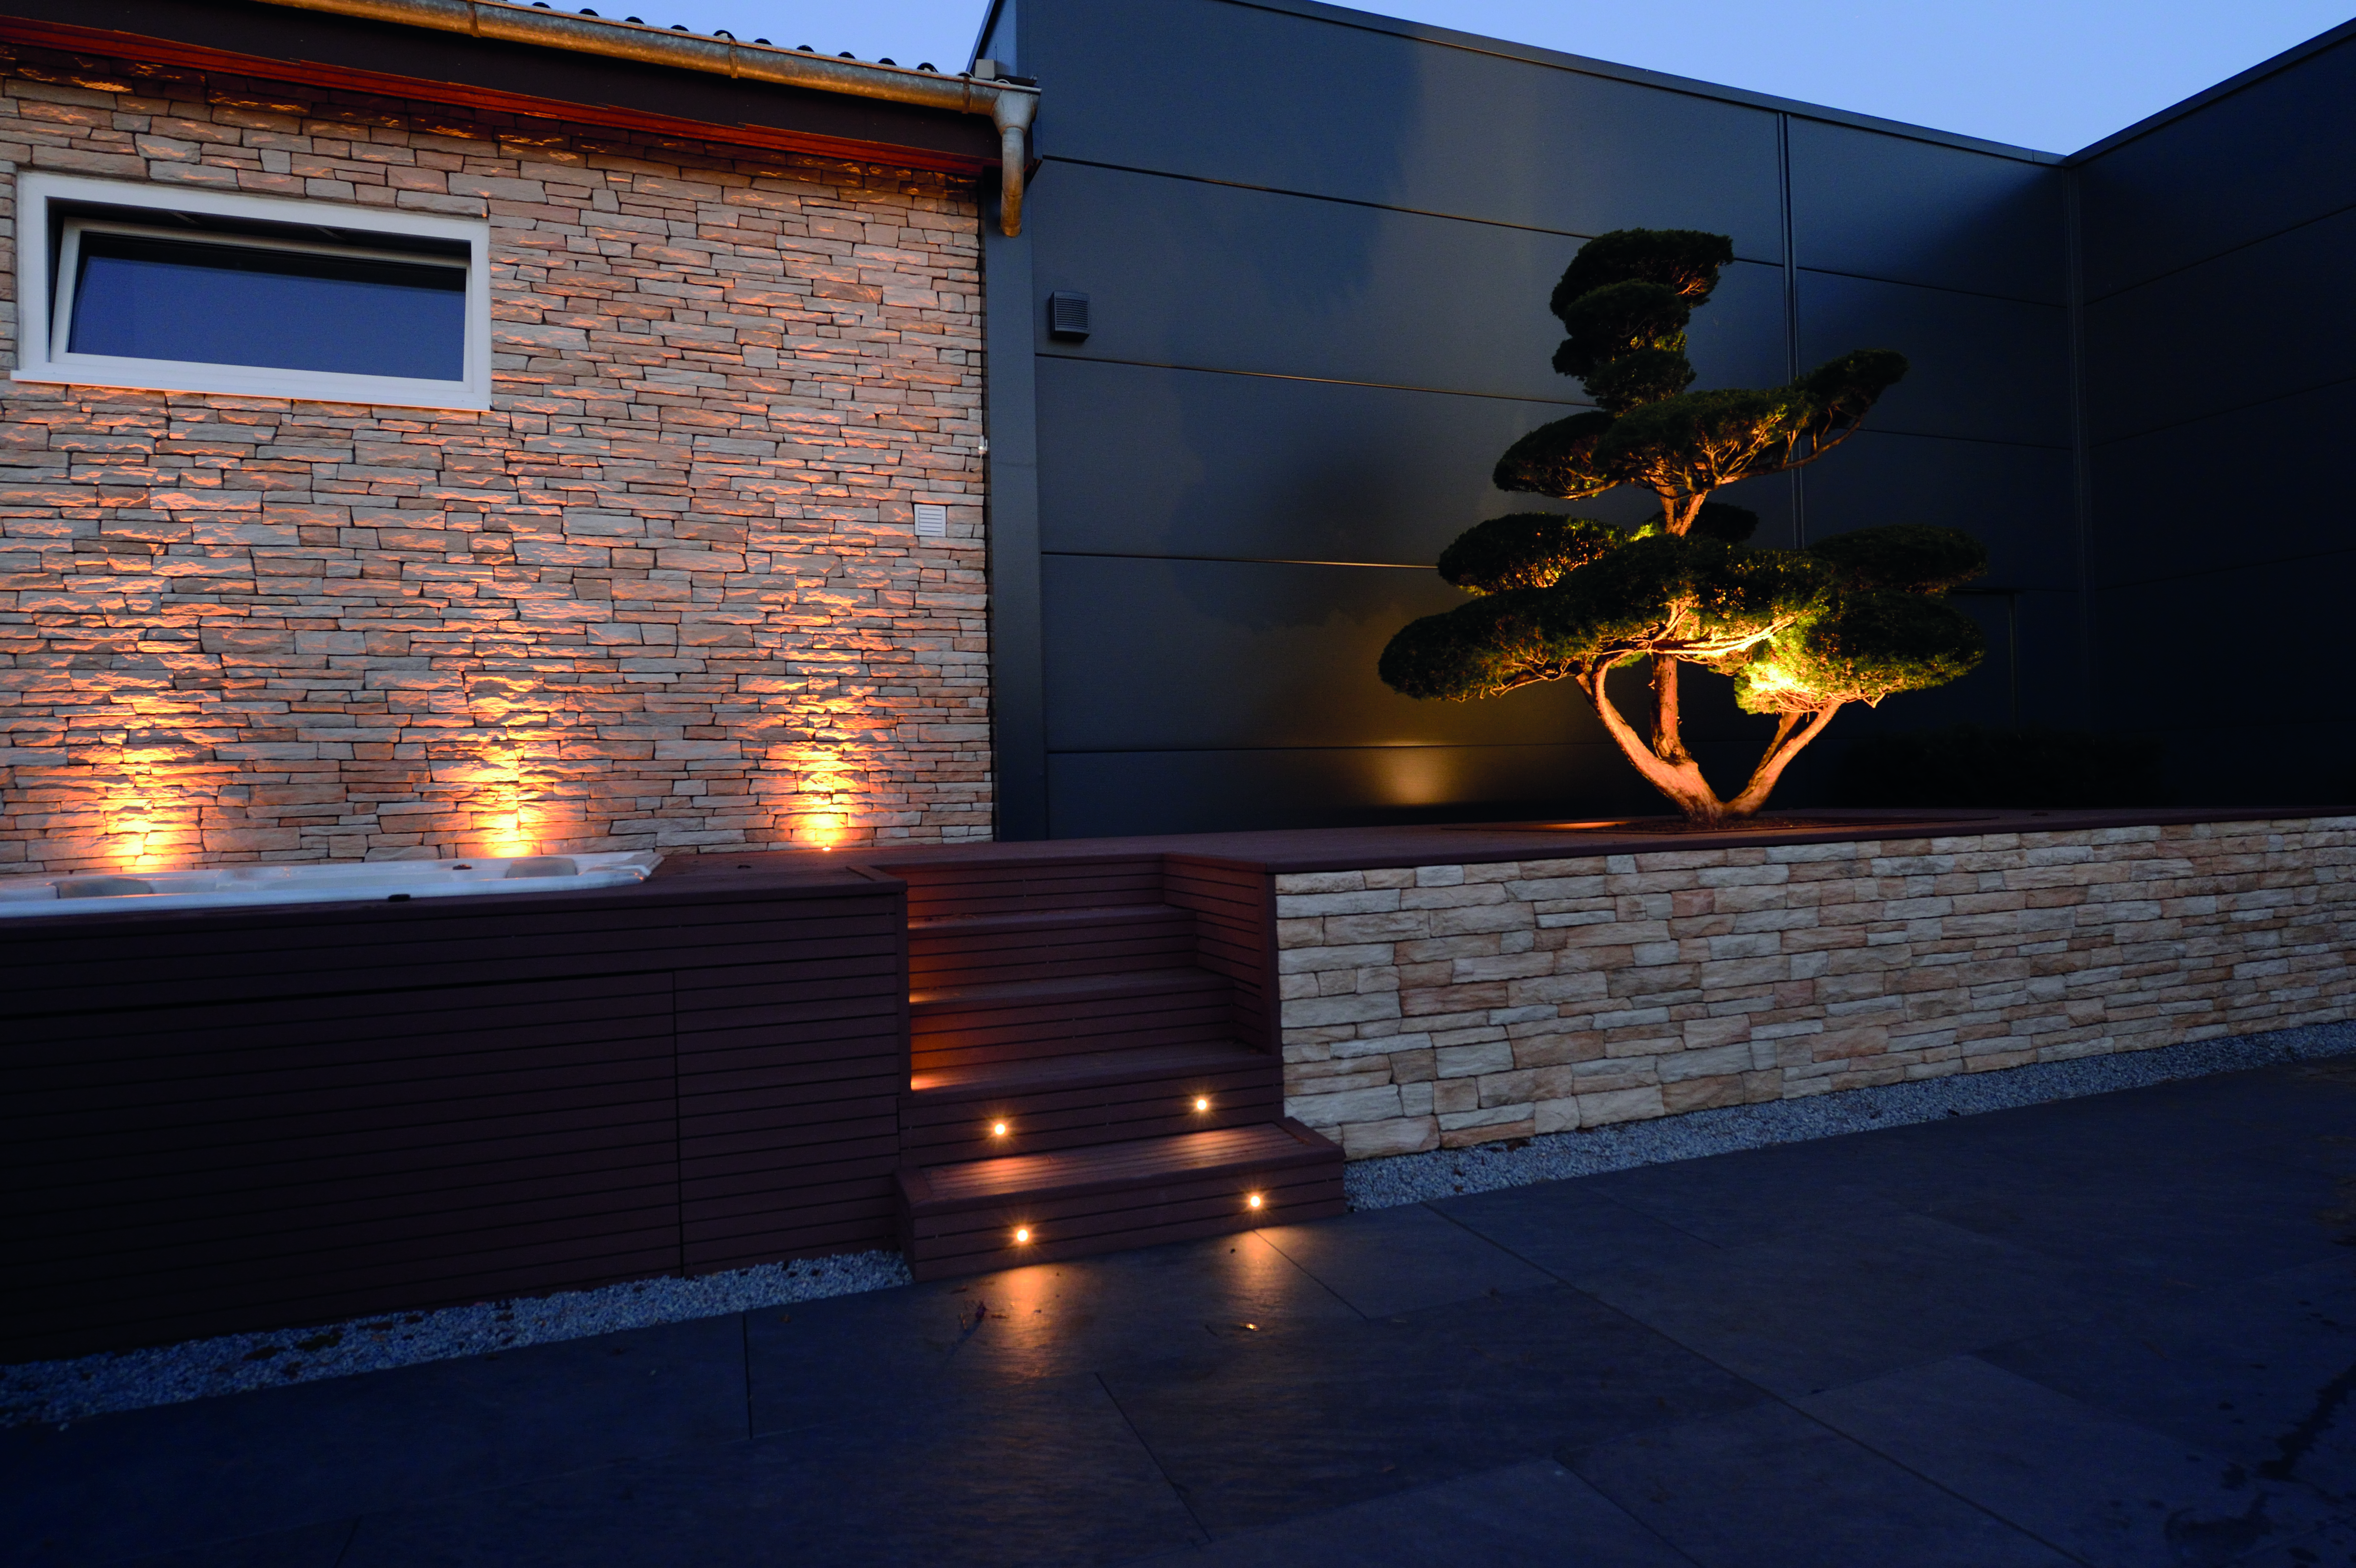 terrassenbeleuchtung boden swalif. Black Bedroom Furniture Sets. Home Design Ideas